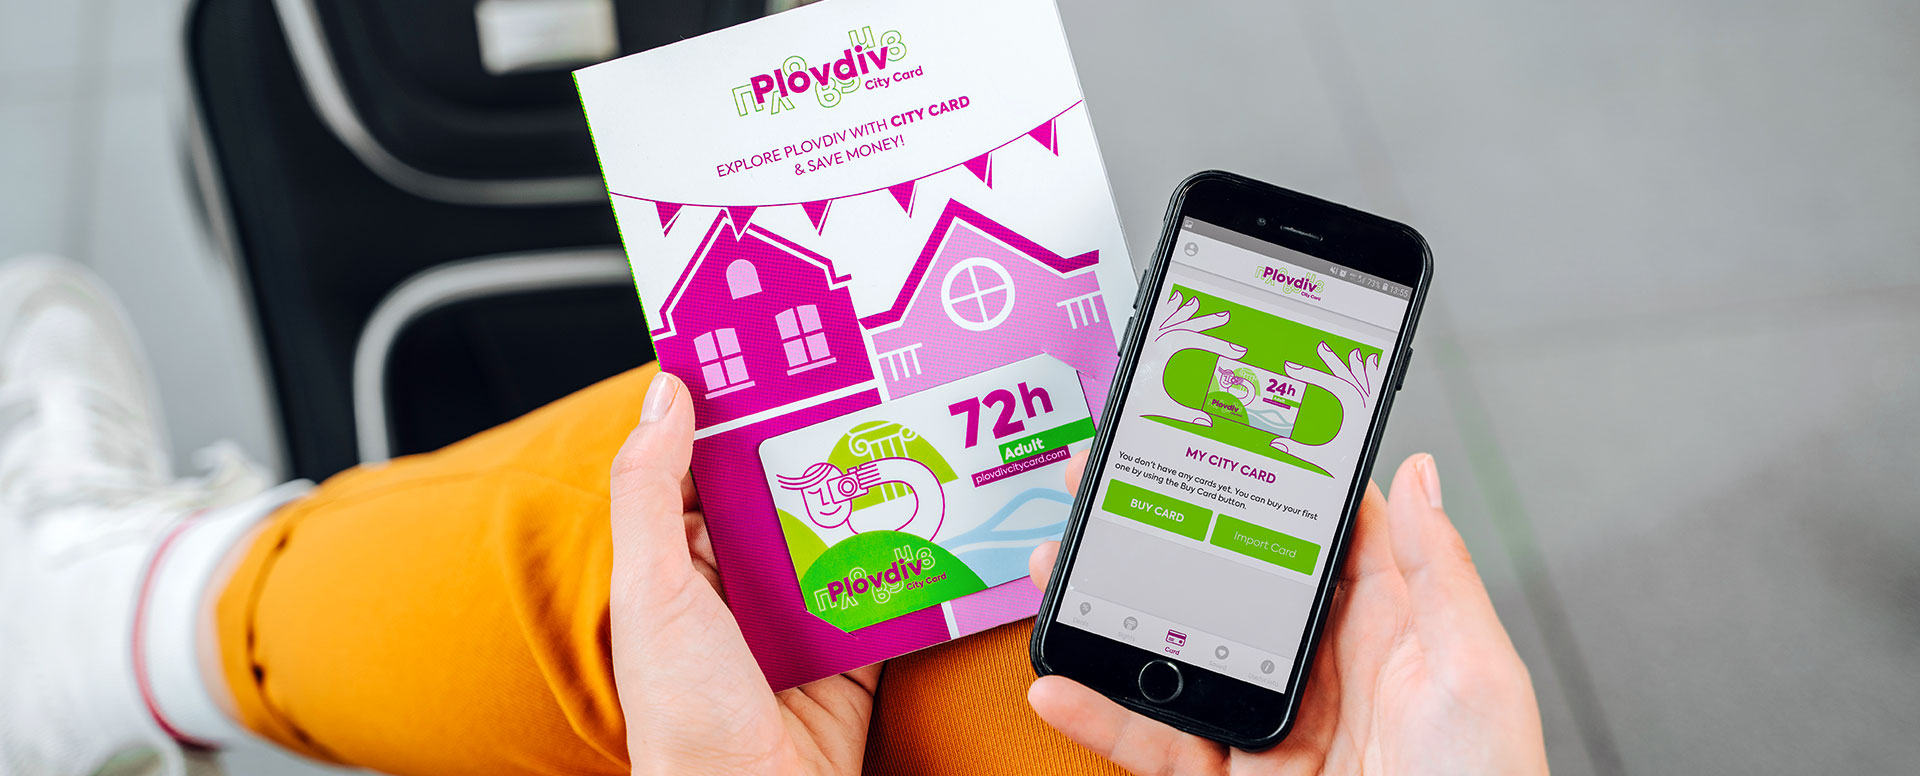 plovdiv-city-card-summer-homepage-banner